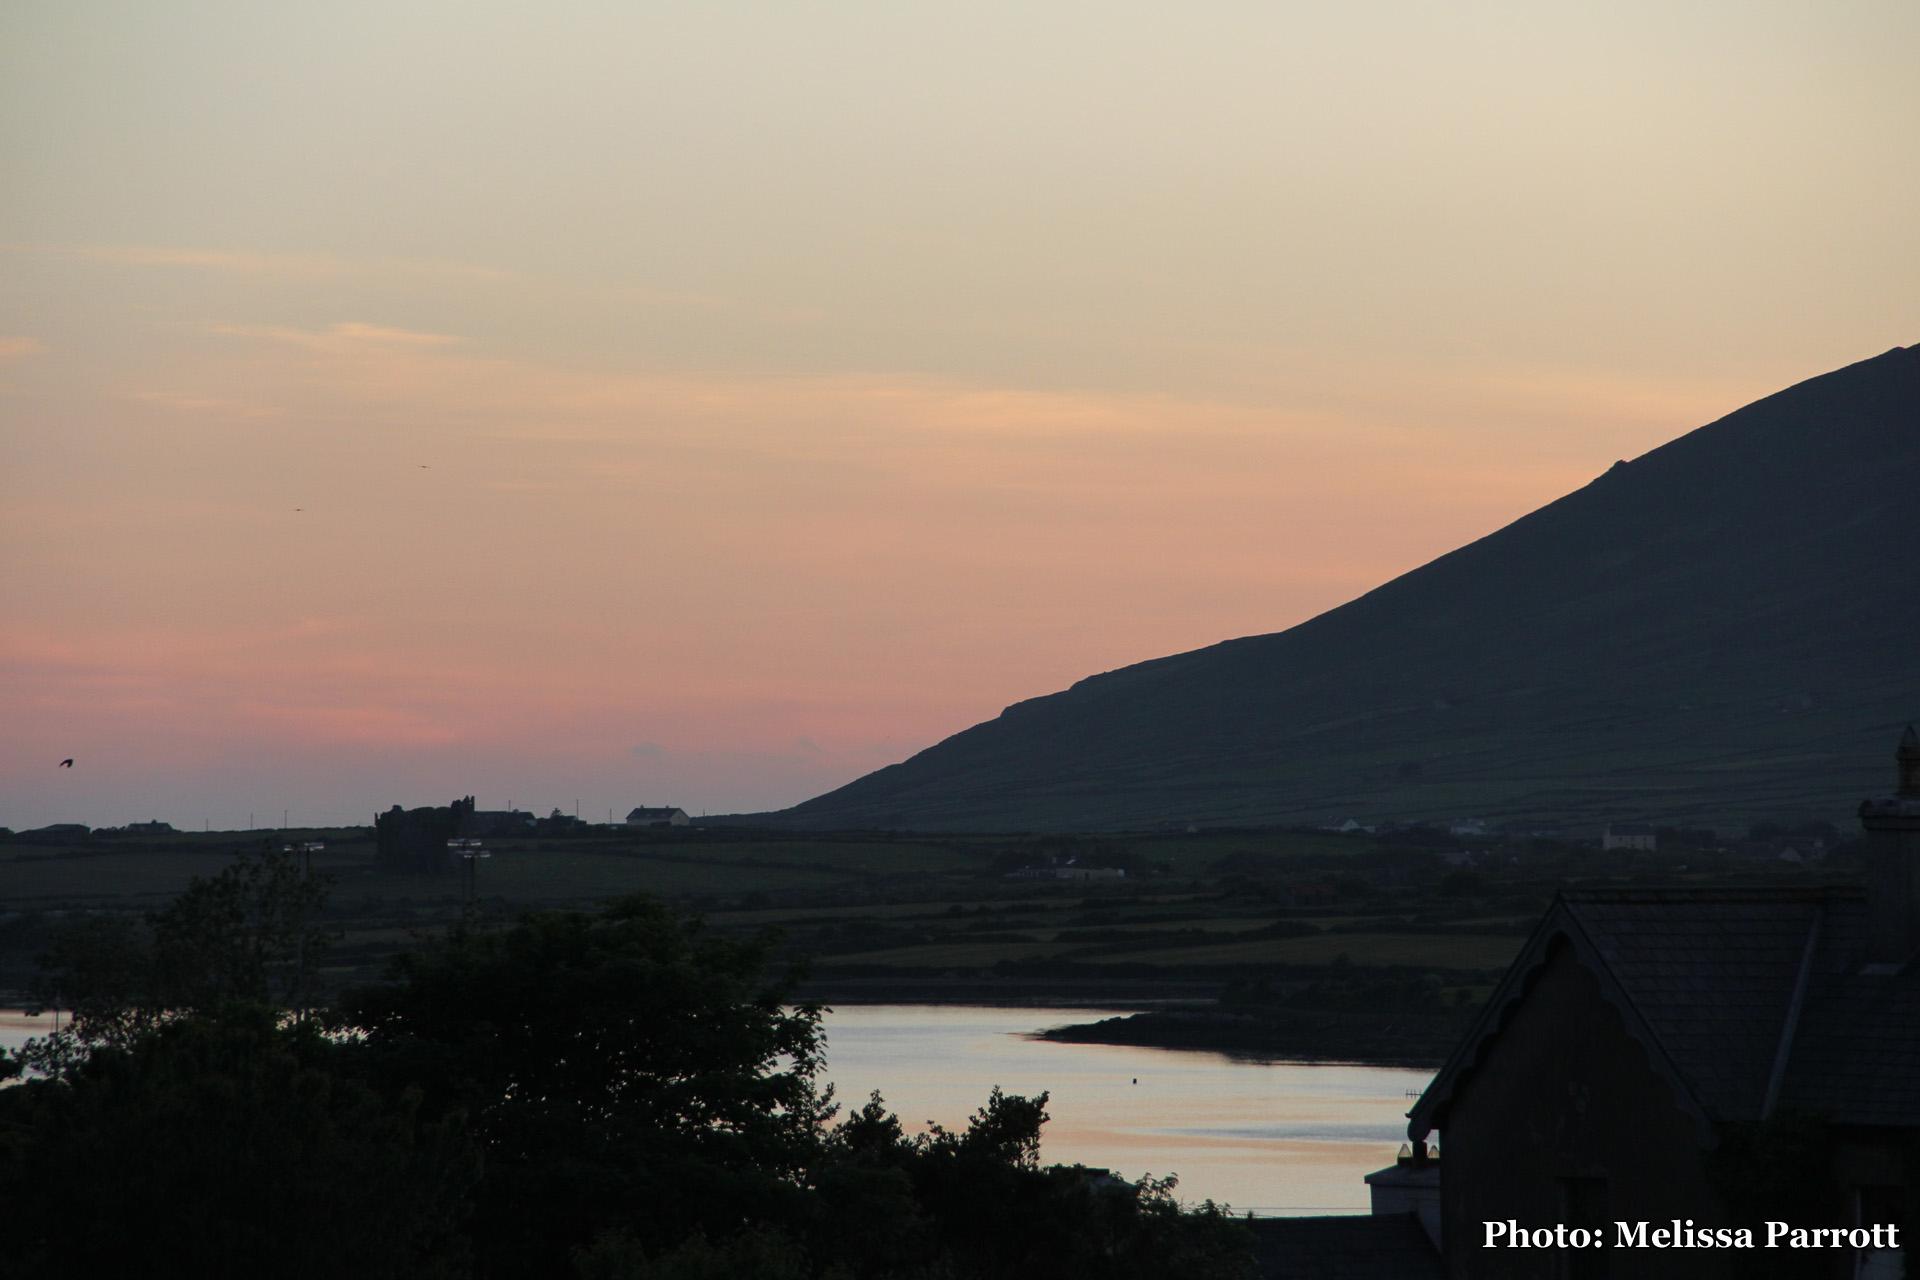 Sun setting over River Fertha